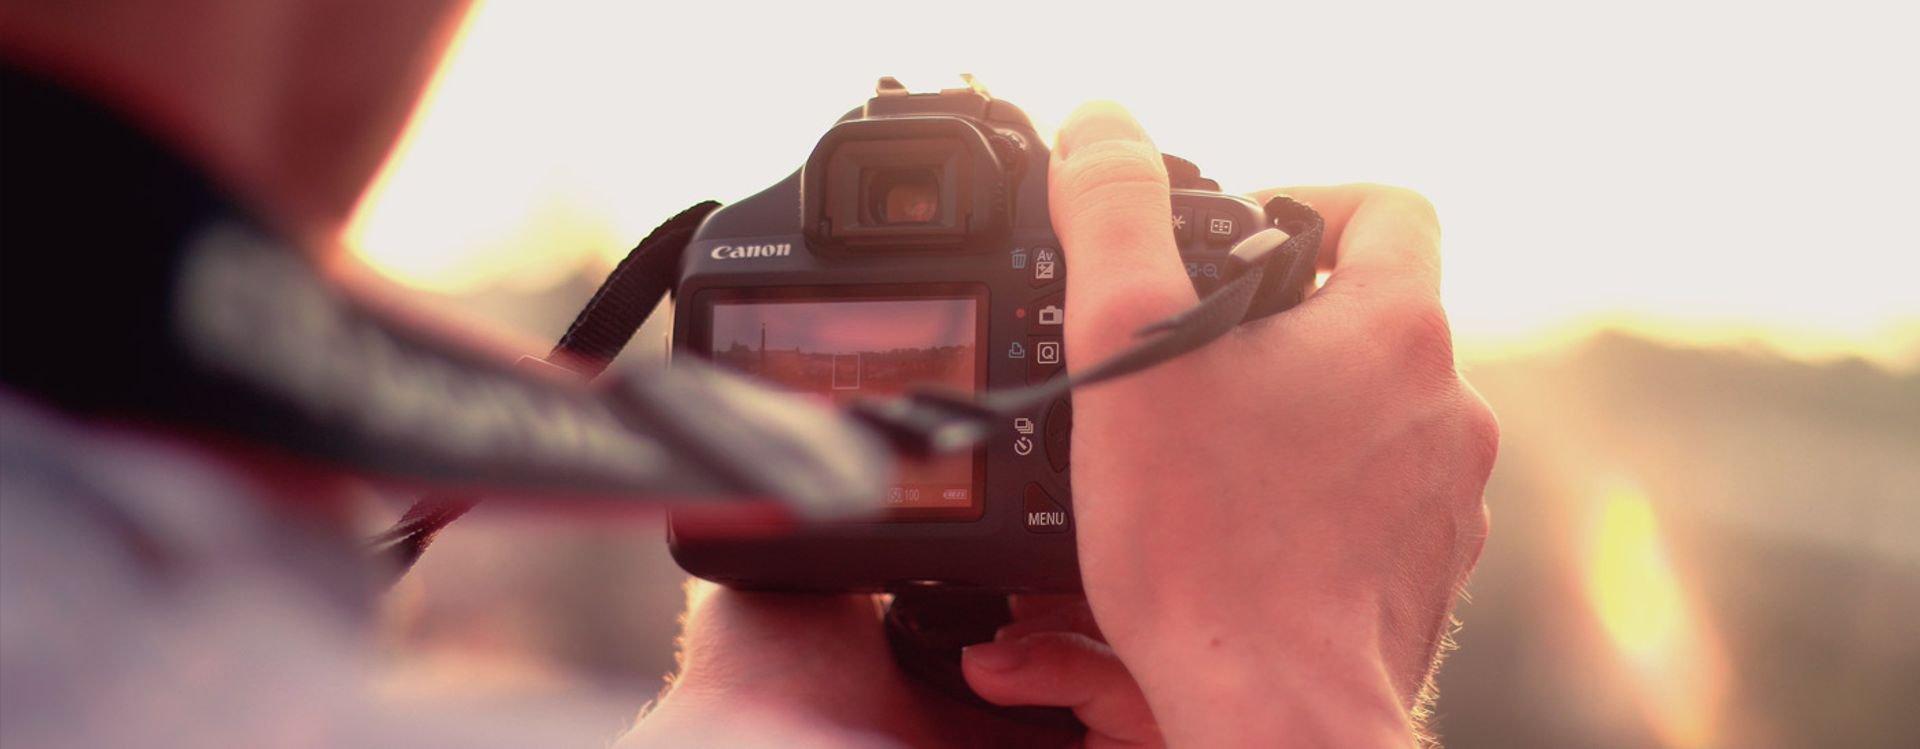 Canon unveils their new digital cameras.